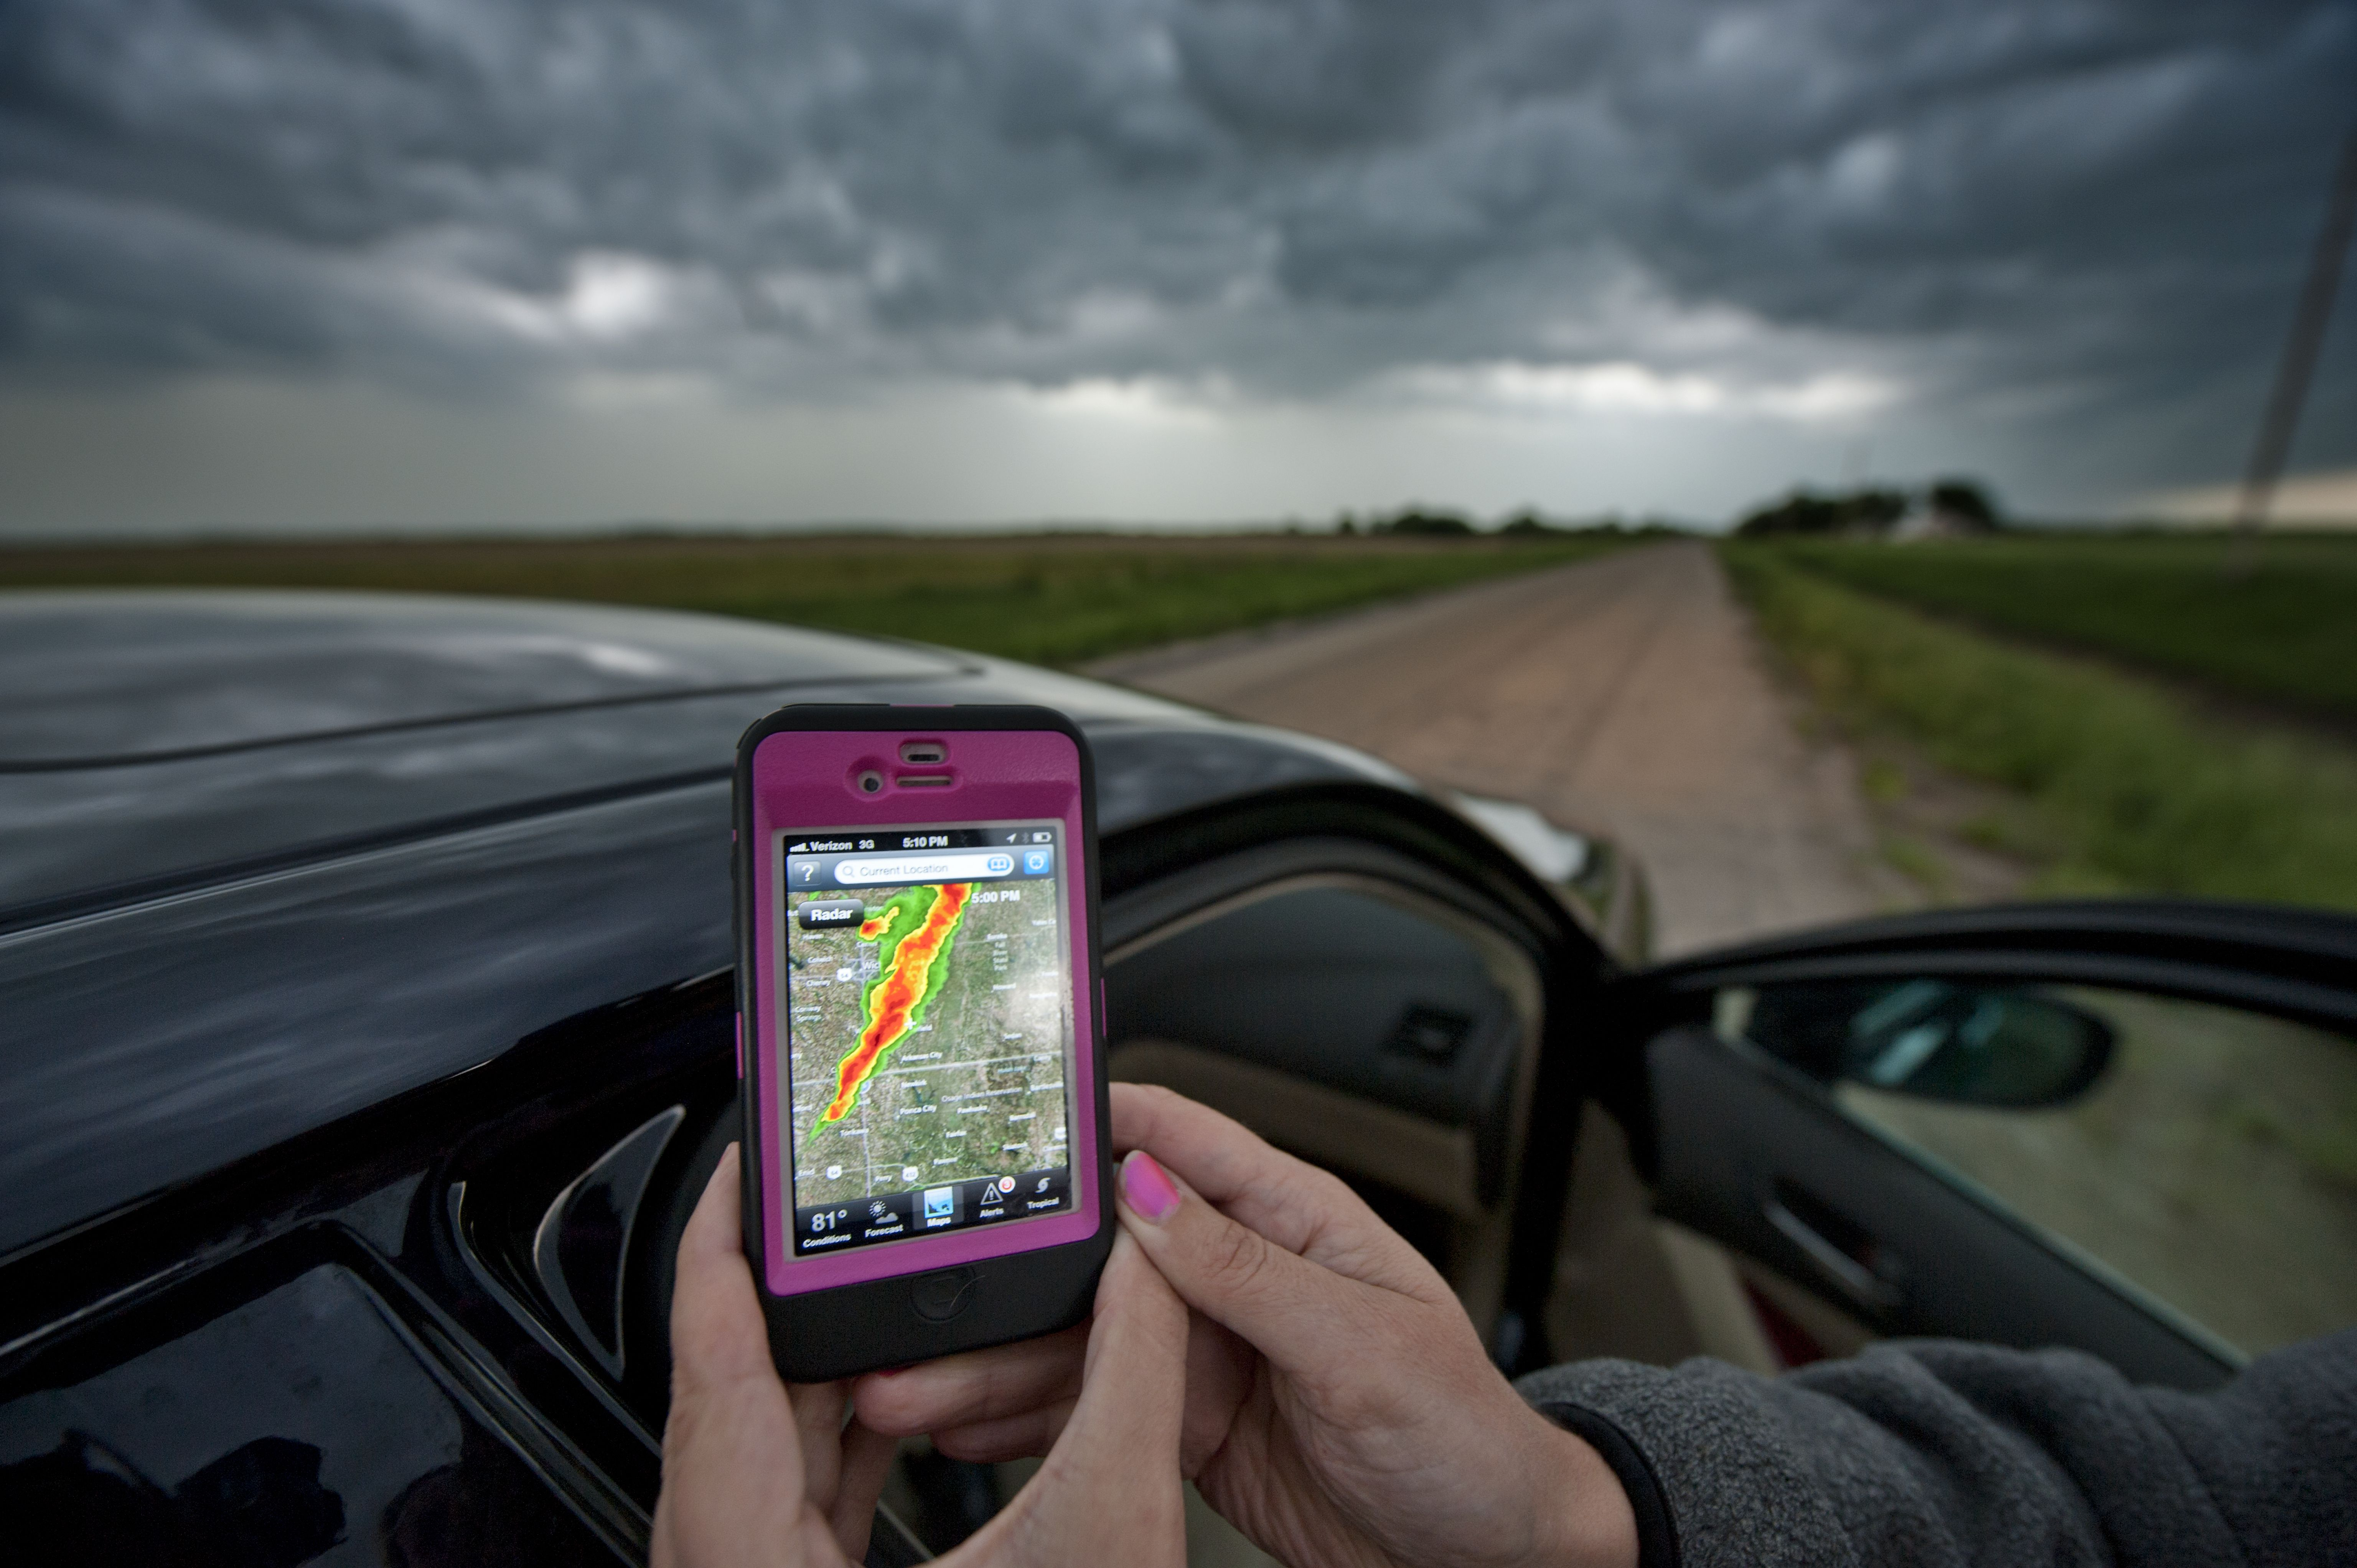 Severe Weather in Tornado Alley, Oklahoma